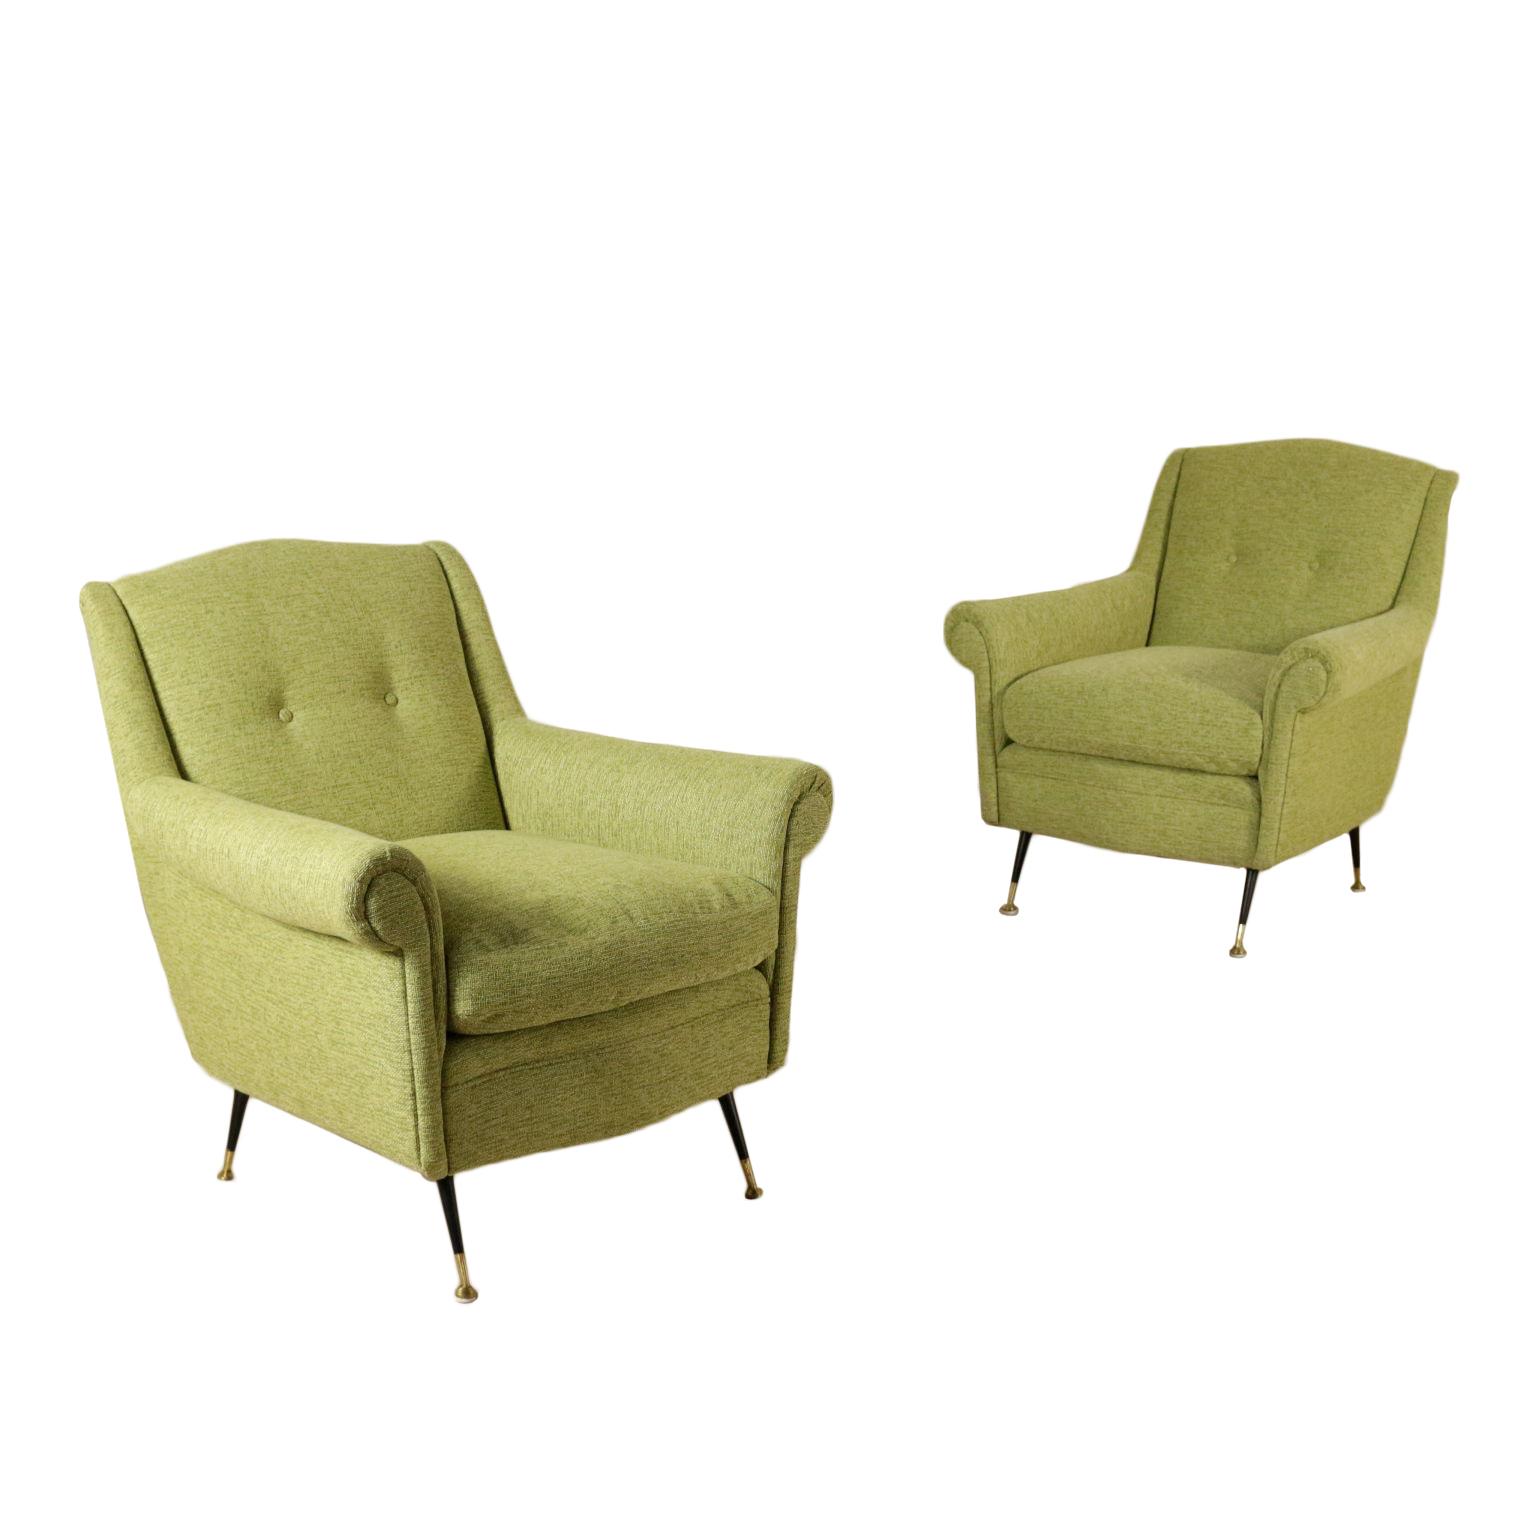 sessel 60er design sessel er jahre sessel er jahre neueste knoll sessel er walter gebraucht. Black Bedroom Furniture Sets. Home Design Ideas